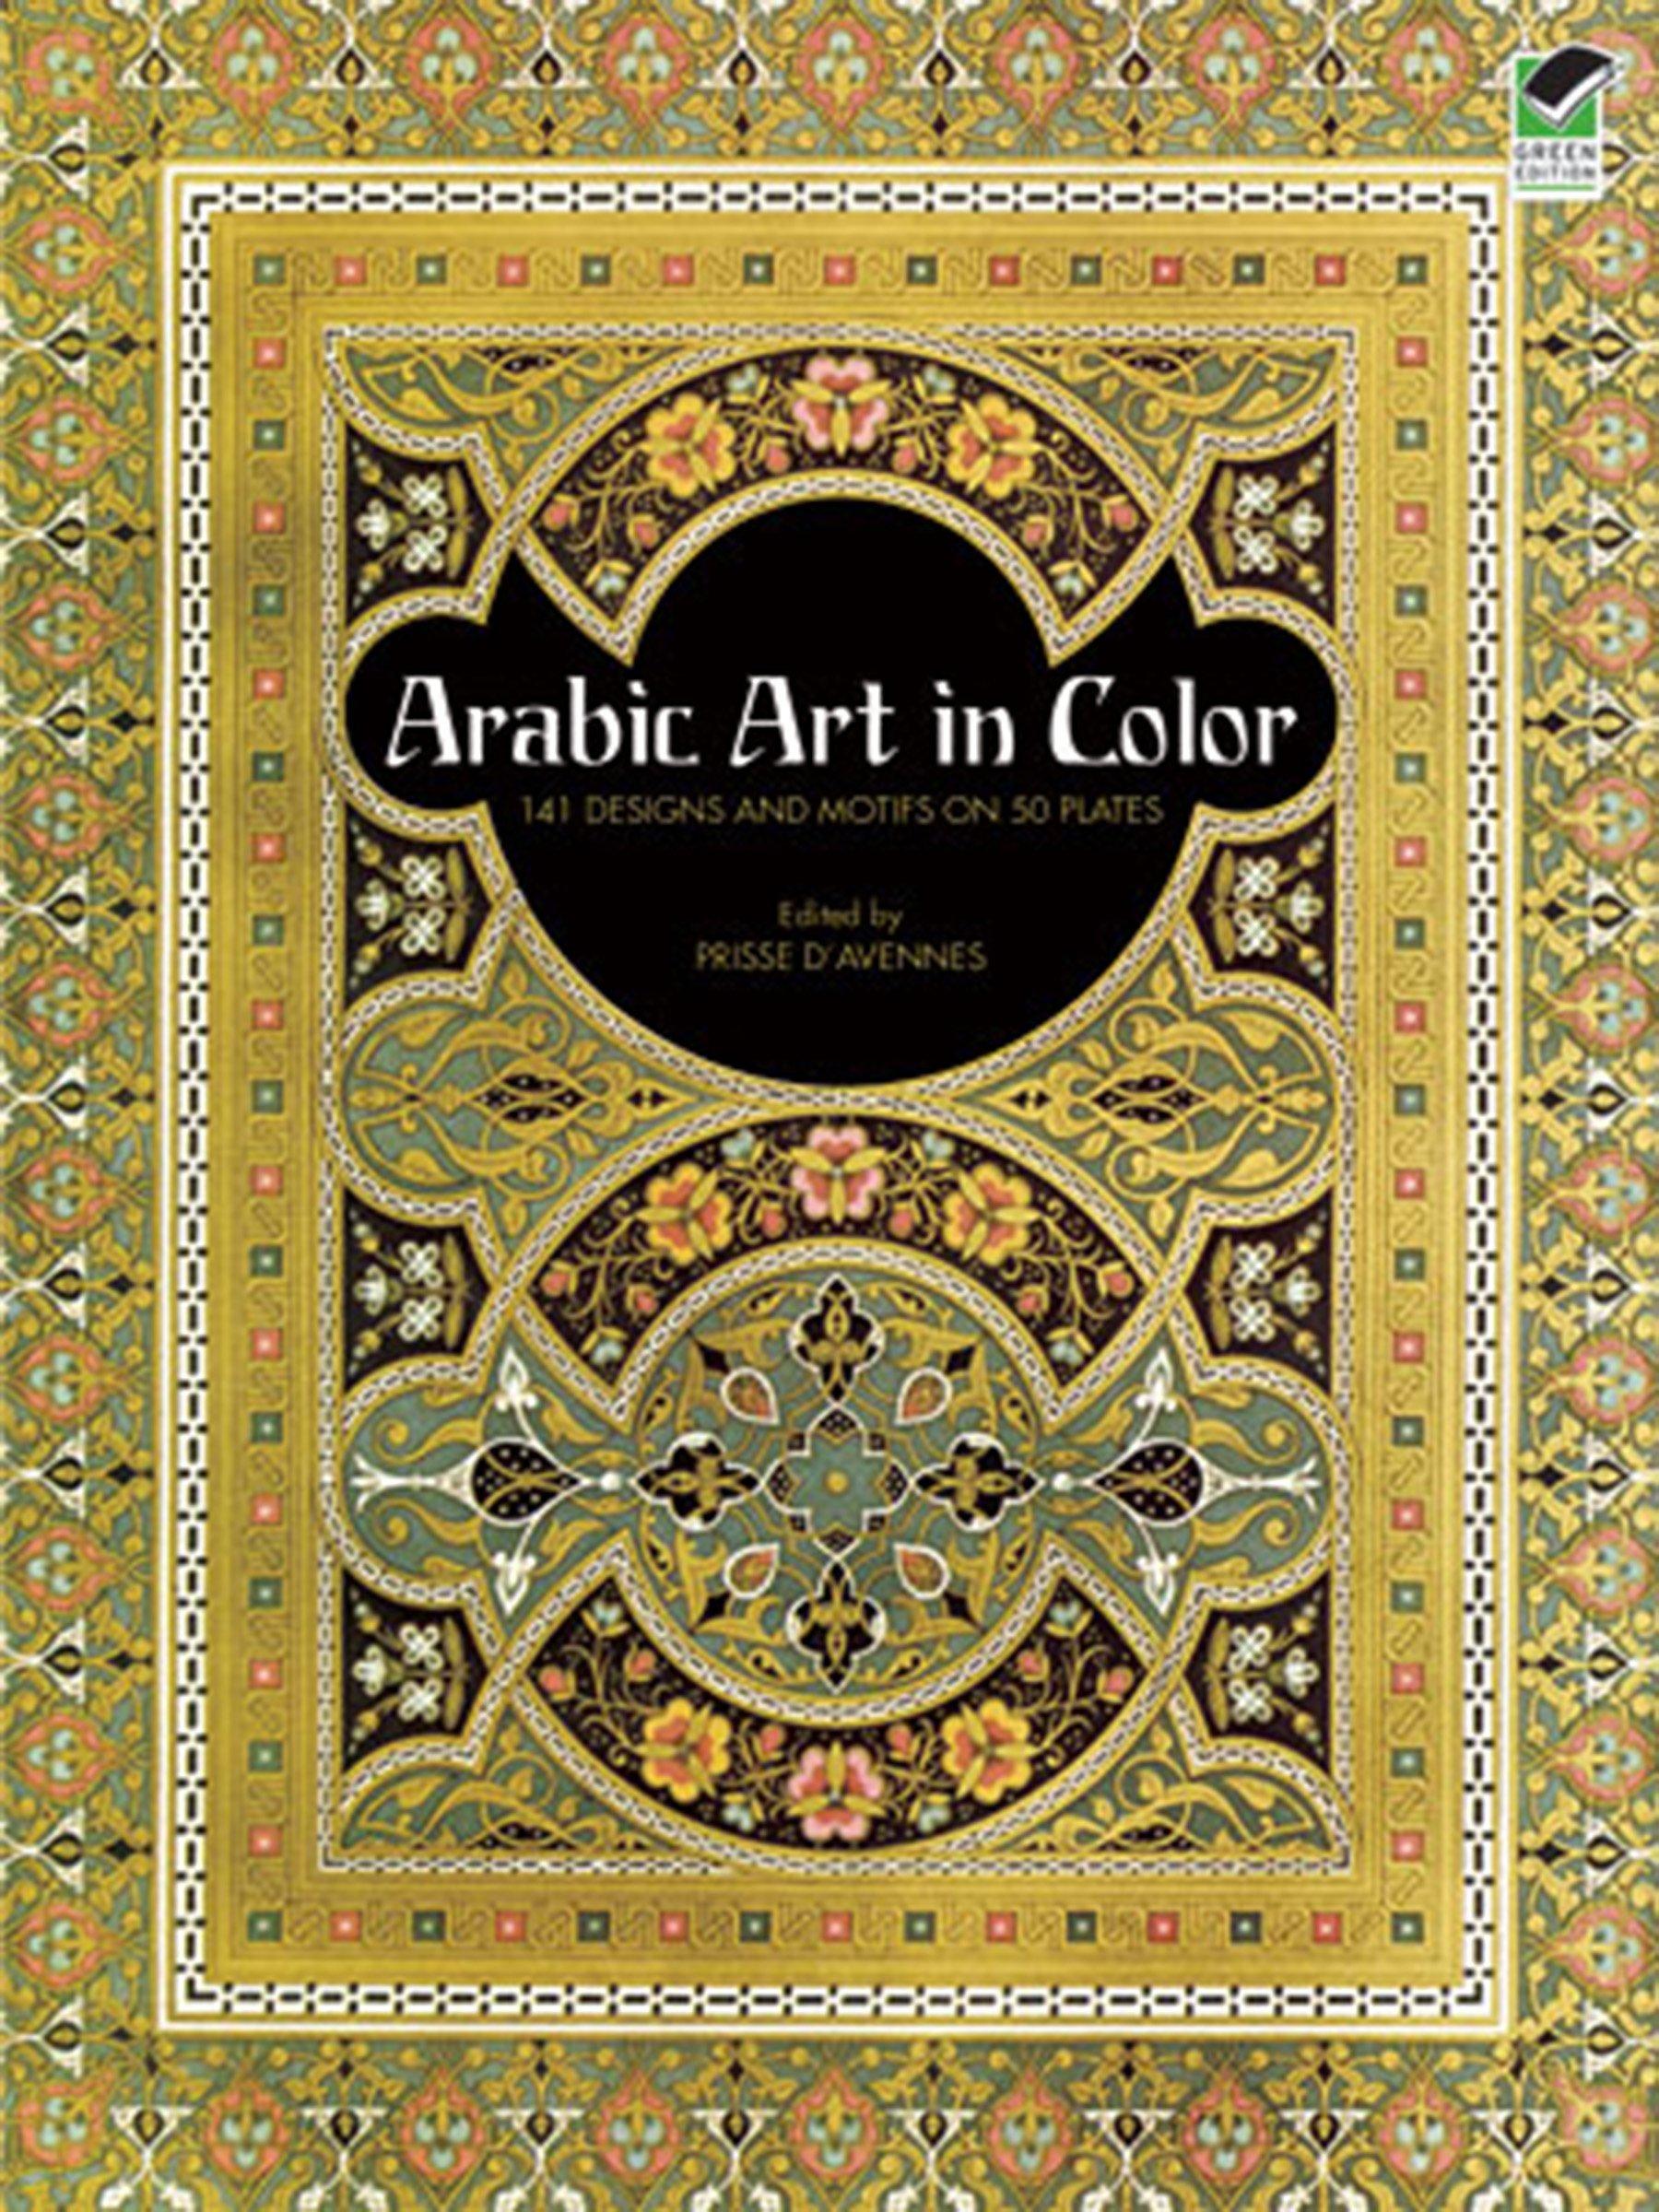 Arabic Art in Color (Dover Pictorial Archive): Prisse d'Avennes ...